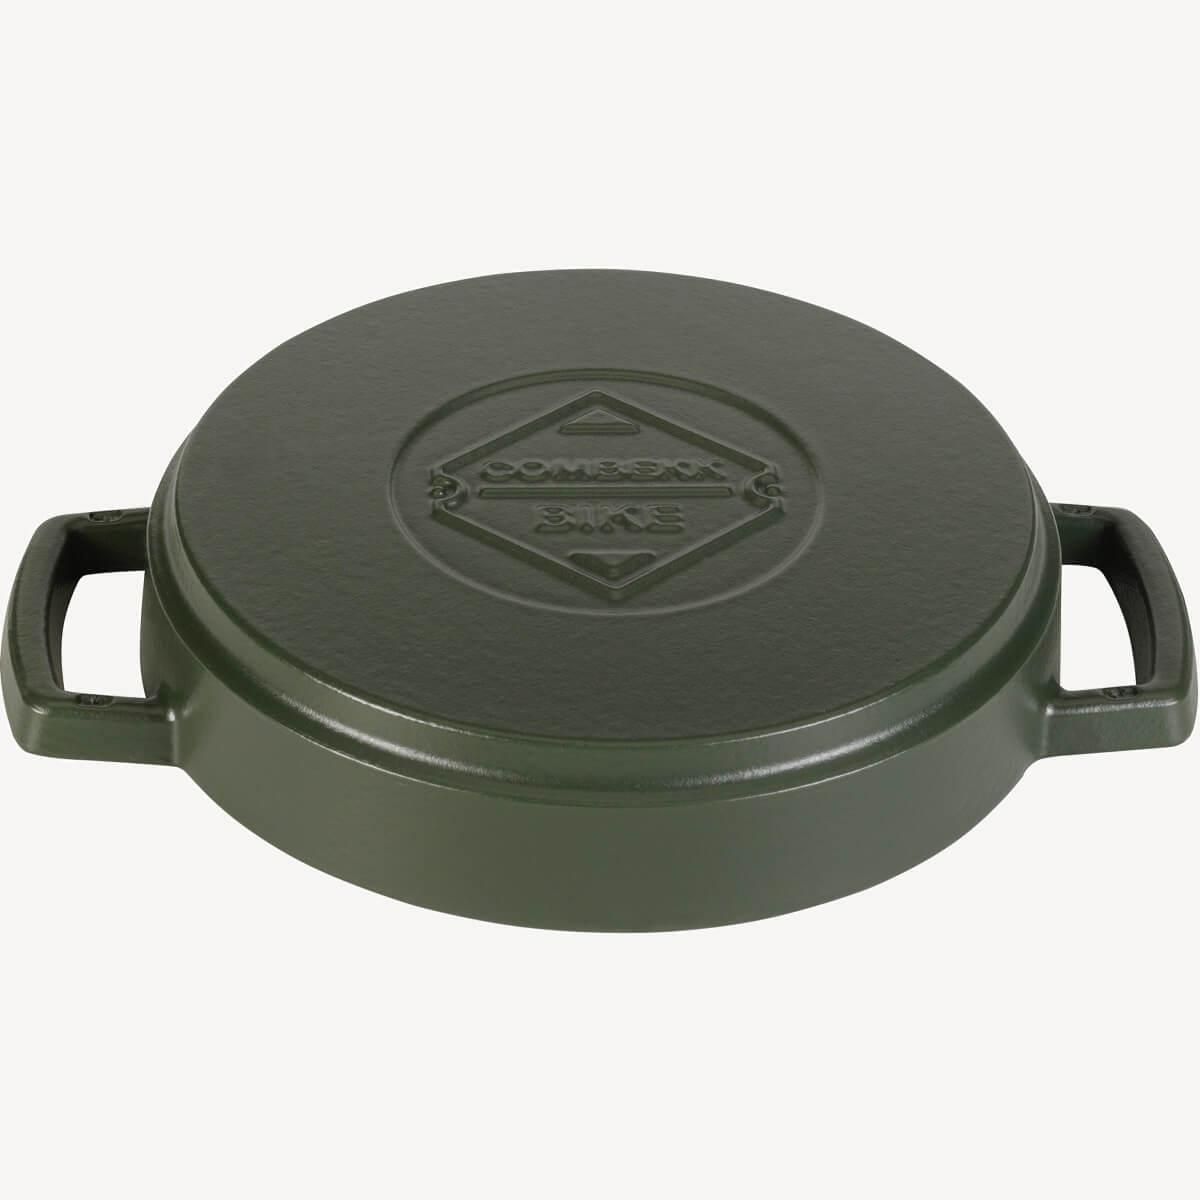 Fry Pan Double Handle Green 24CM